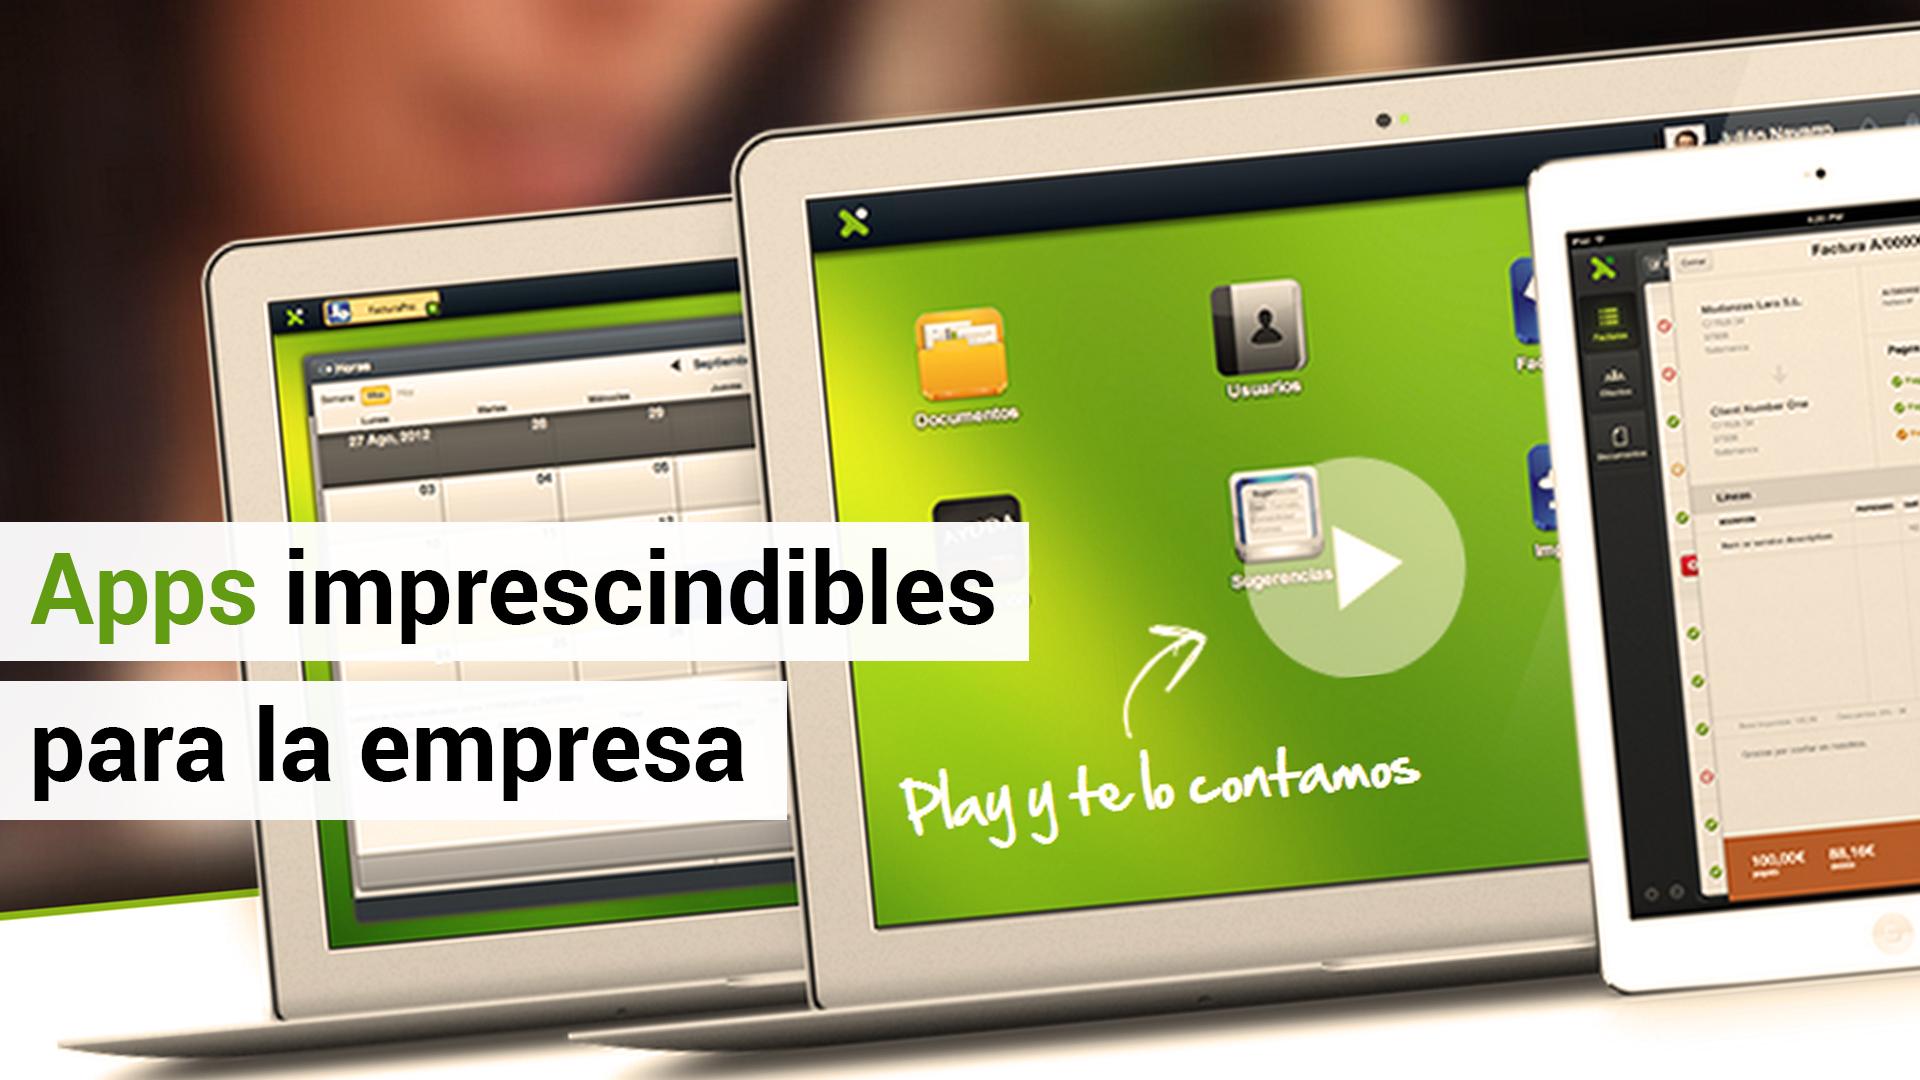 5 apps imprescindibles para tu empresa de servicios